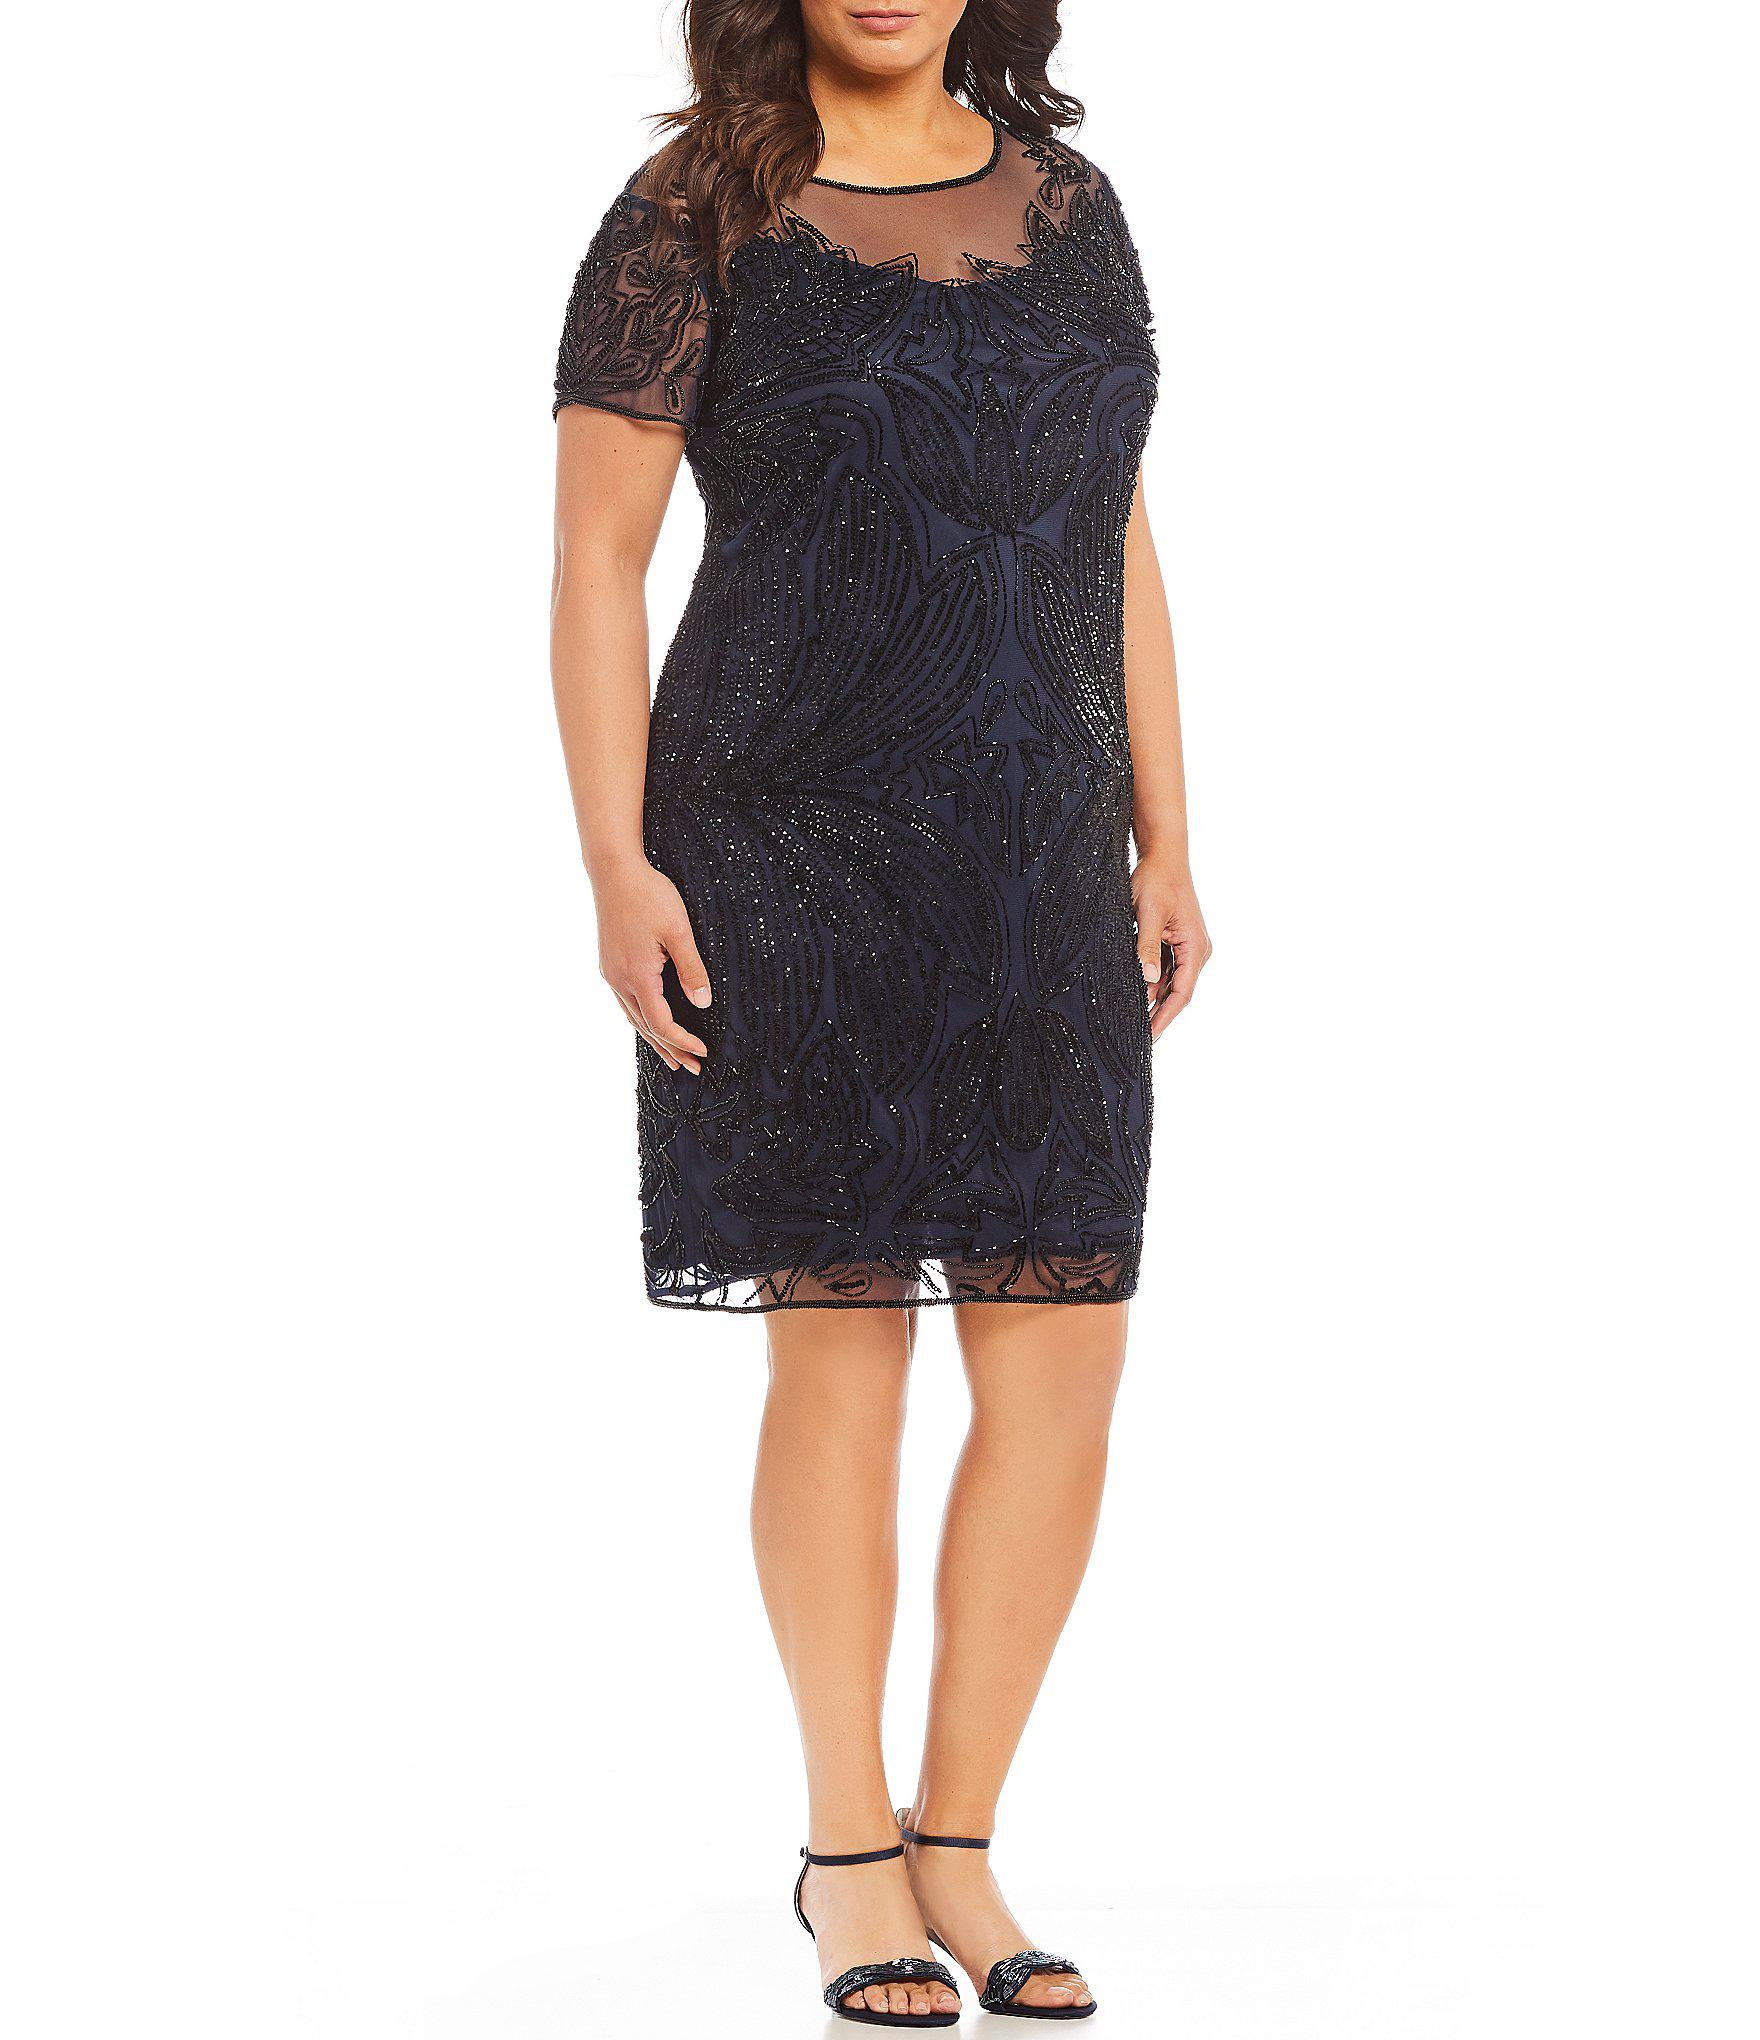 d8c2cbd2487 Lyst - Pisarro Nights Plus Beaded Illusion Dress in Black